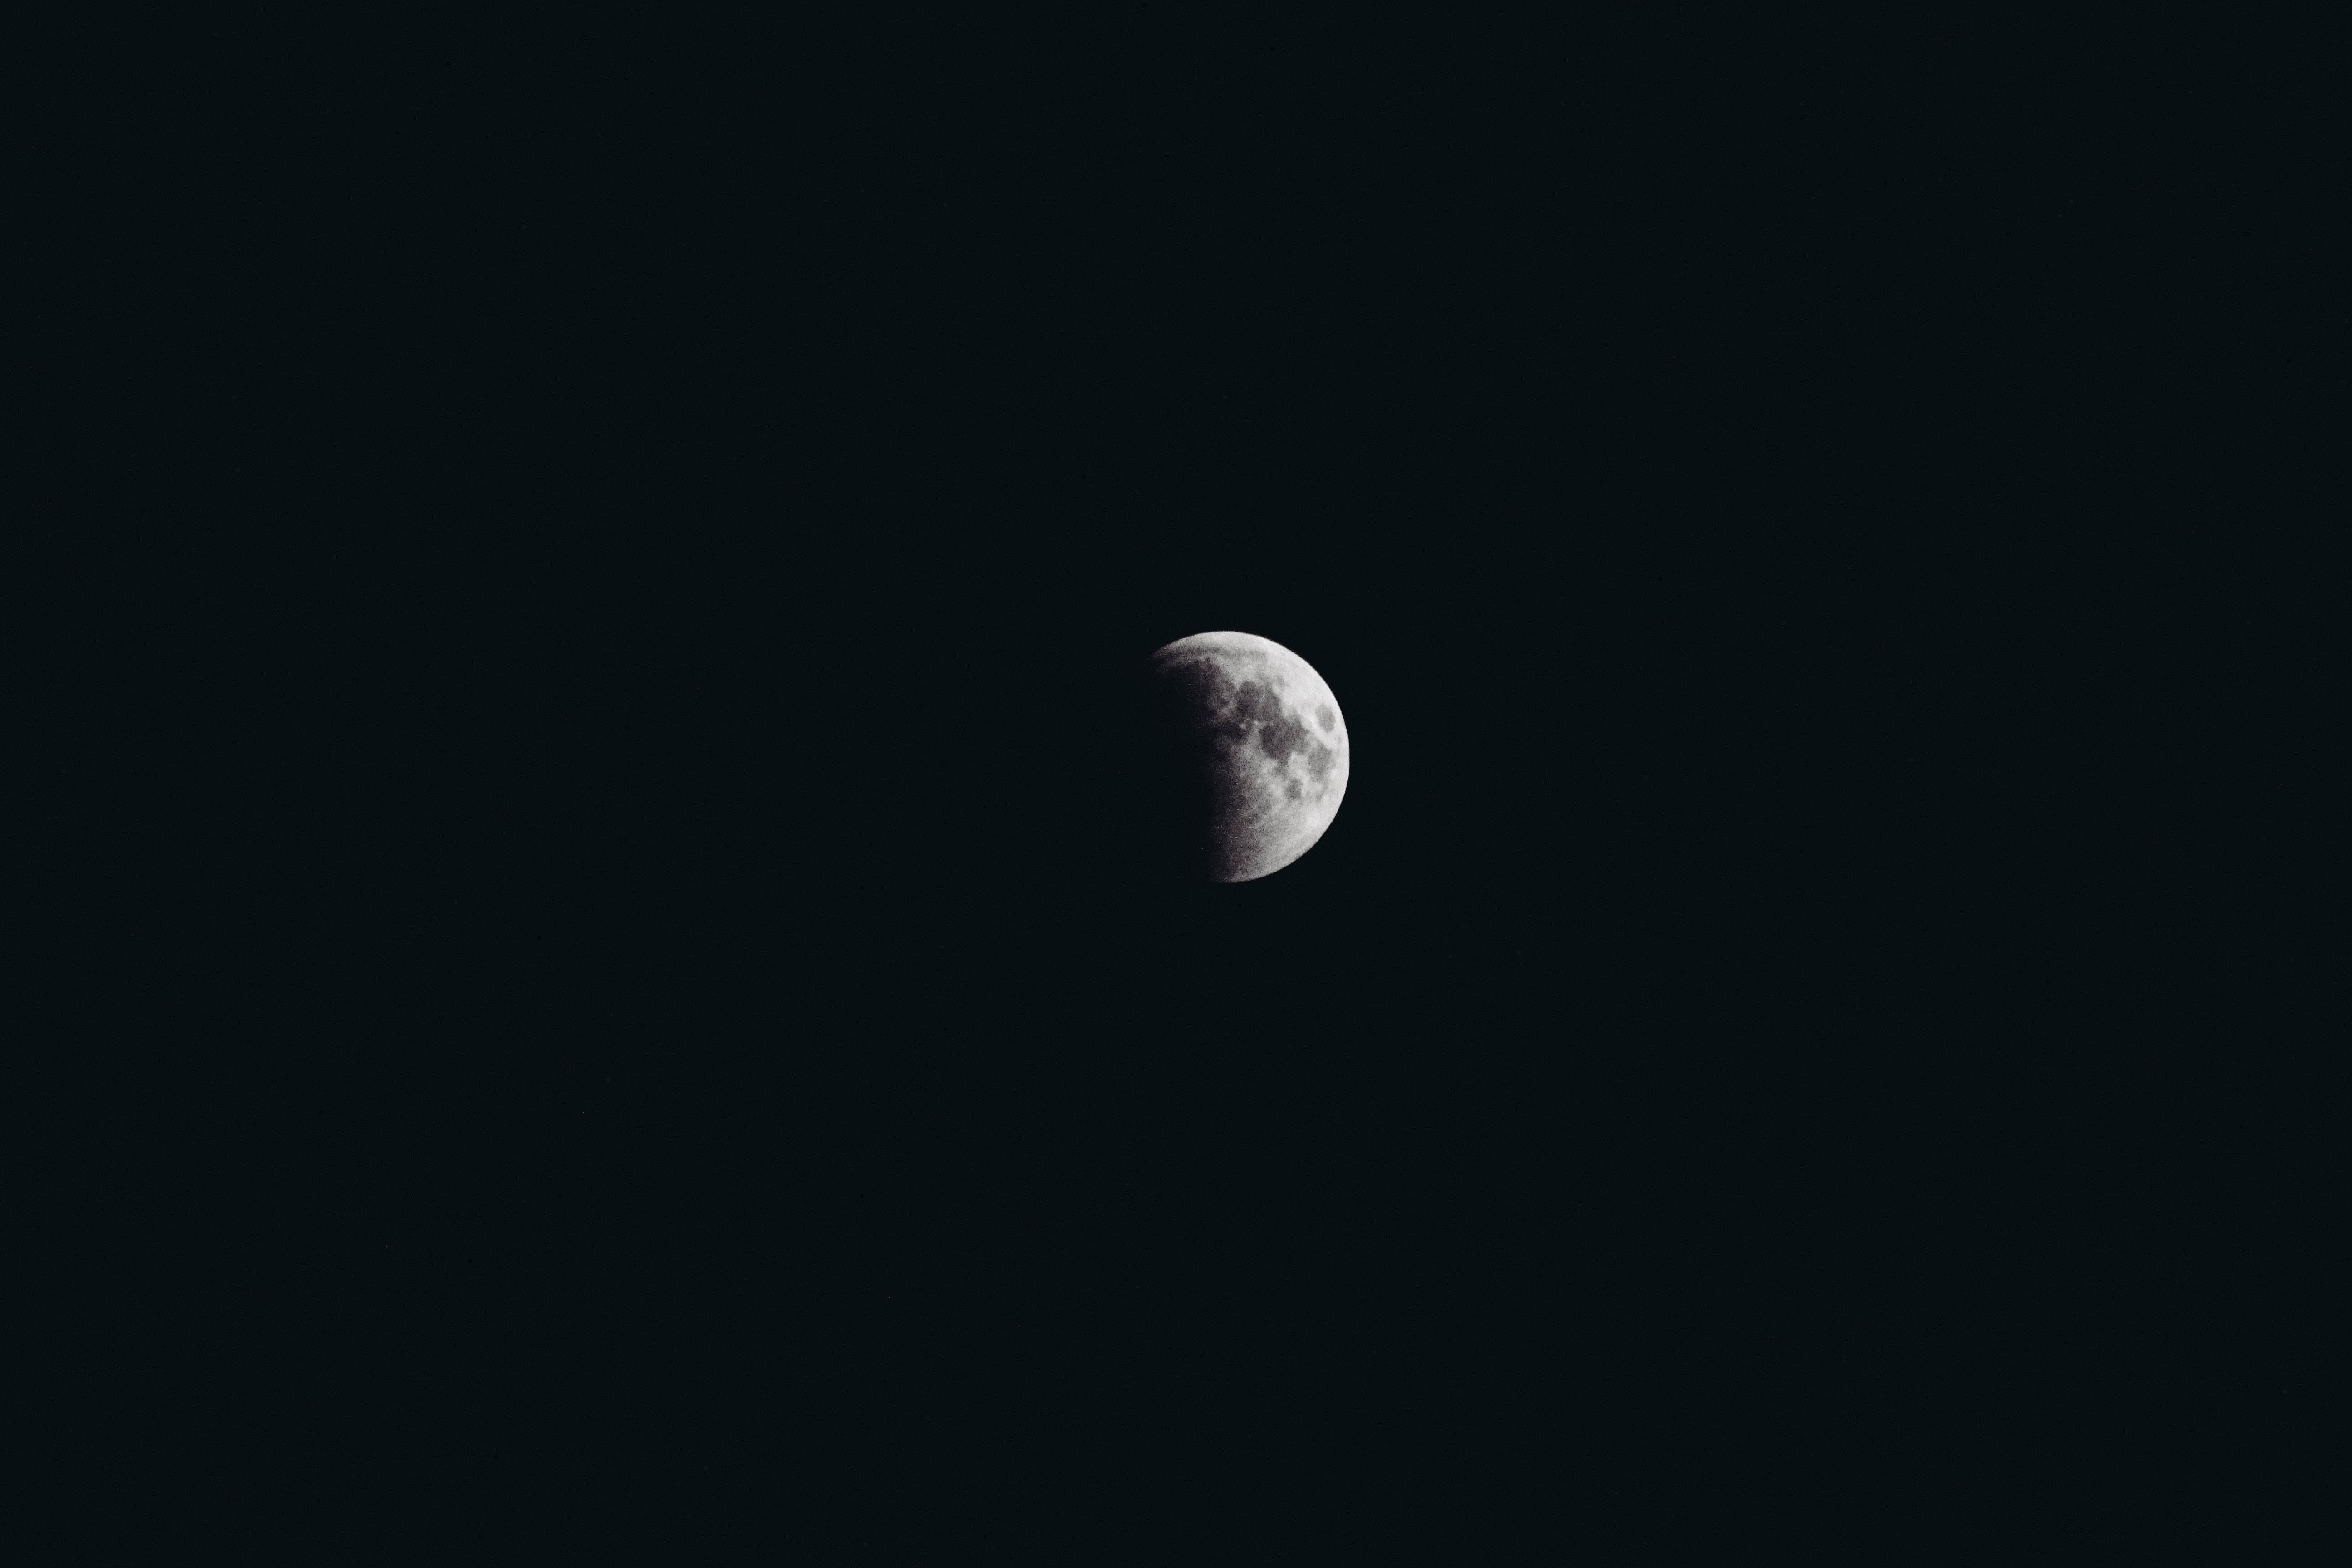 white moon at nighttime